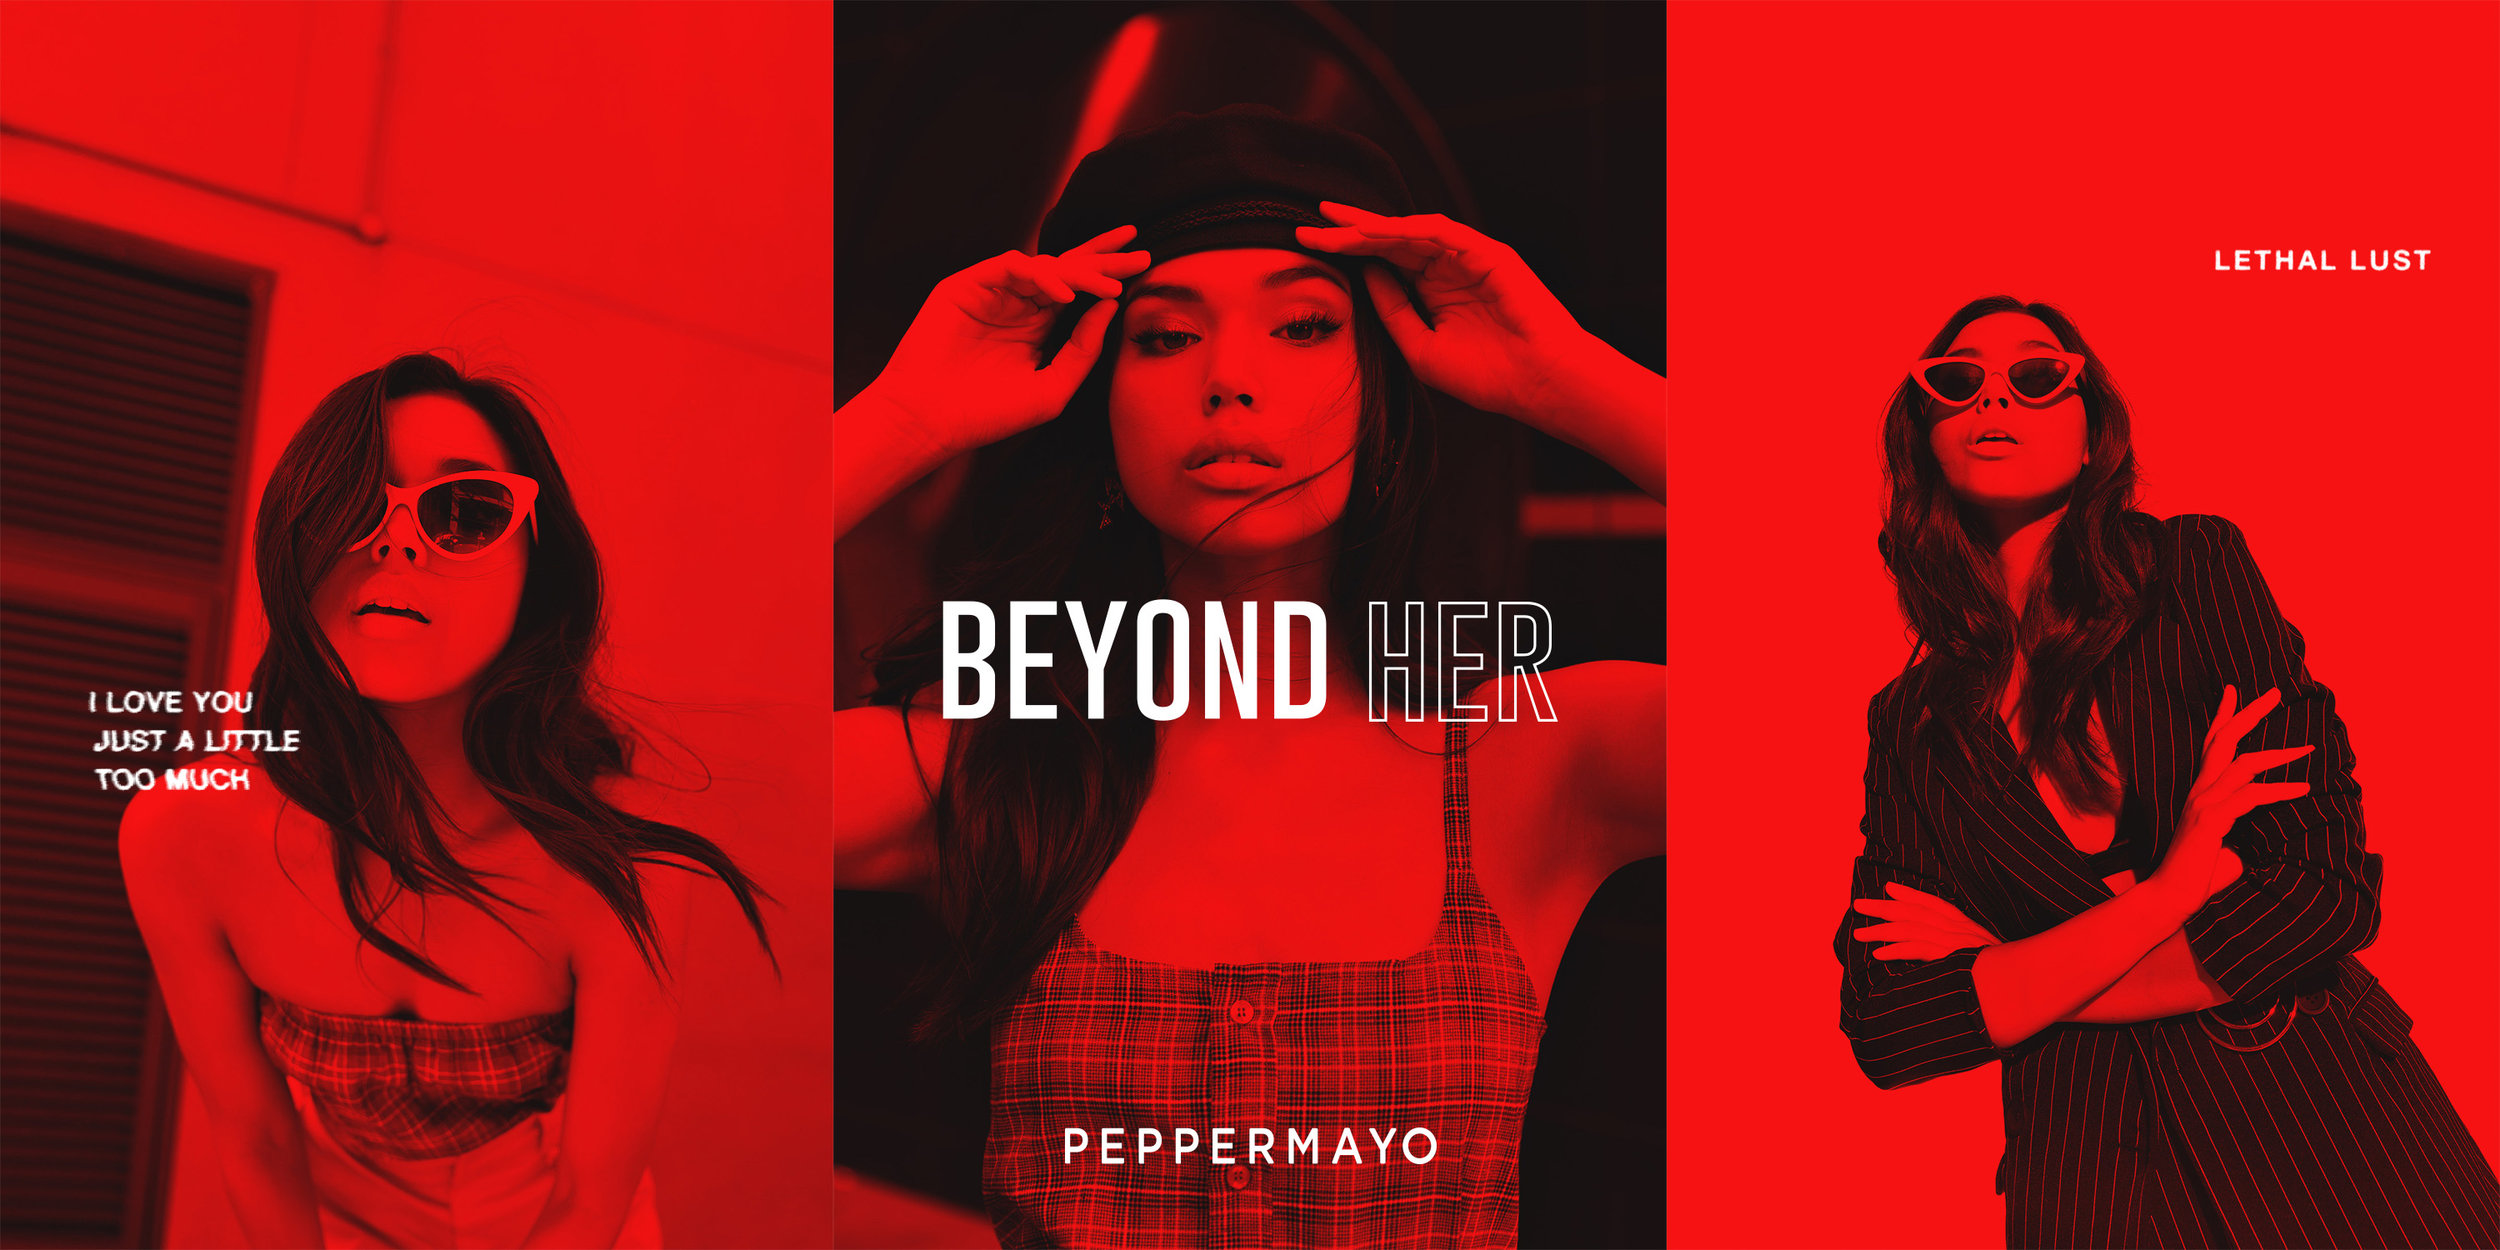 beyond-her-peppermayo-1.jpg